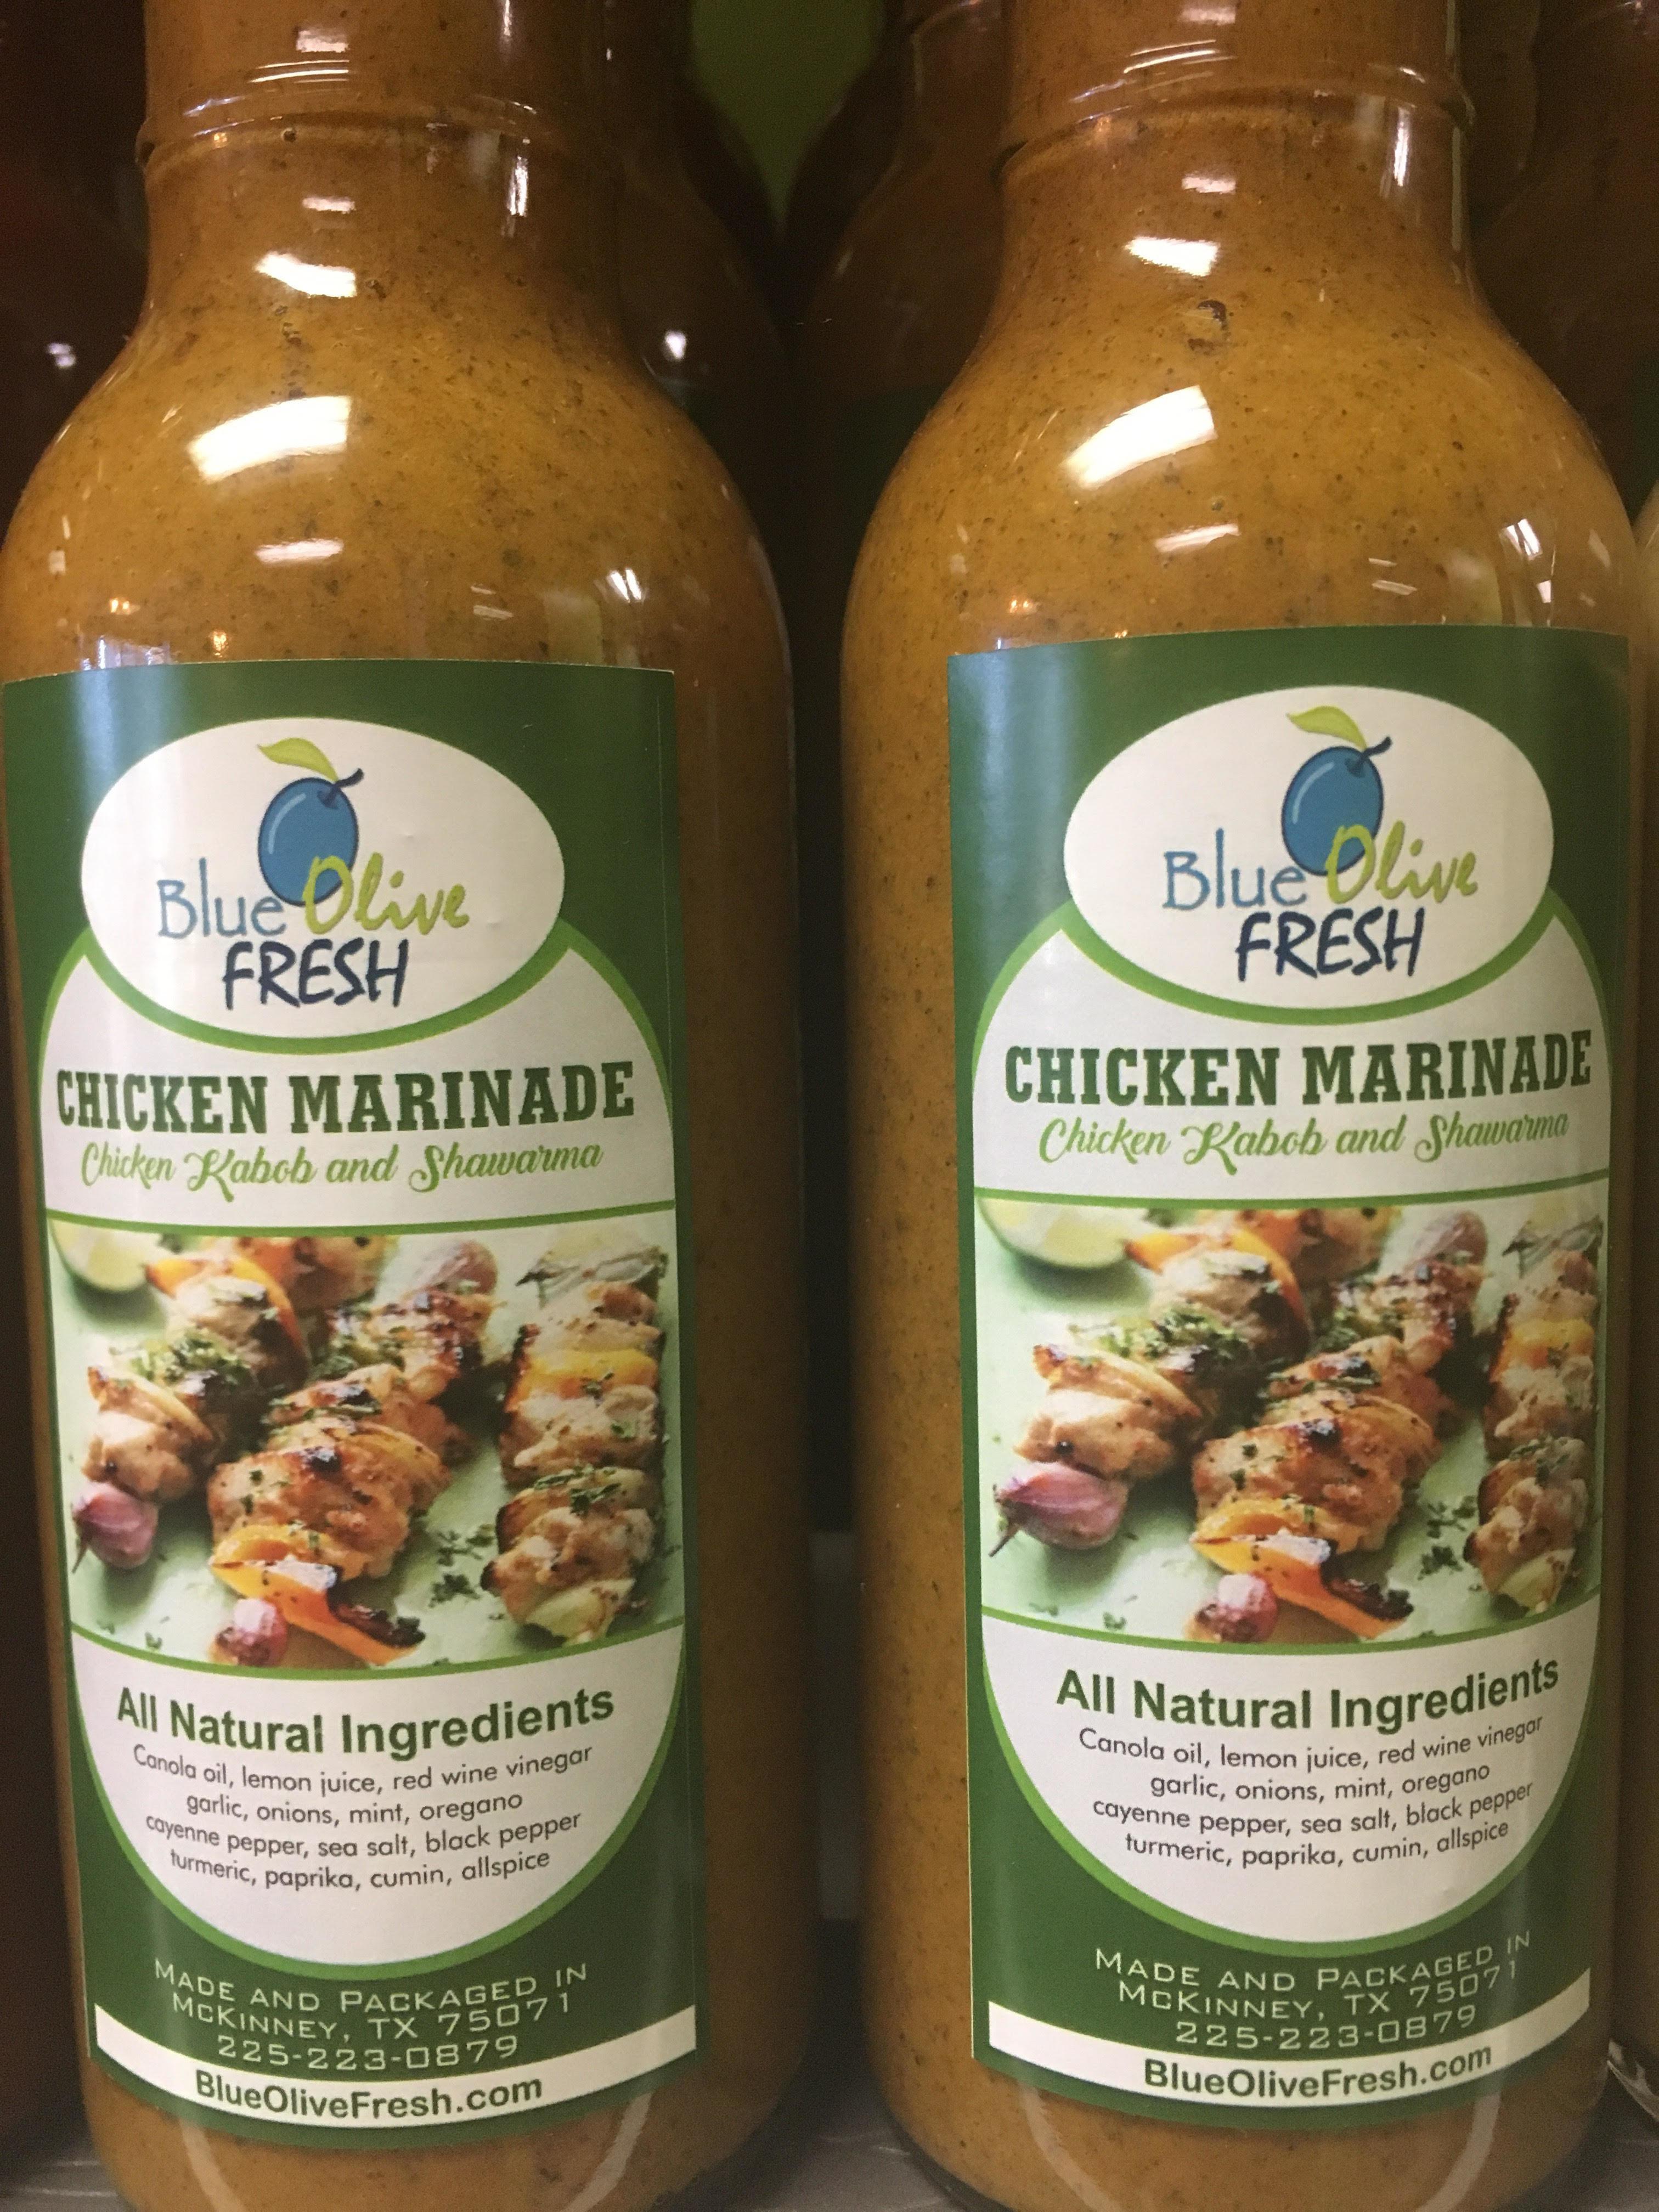 Chicken Marinade - Chicken Kabob & Shawarma 00016